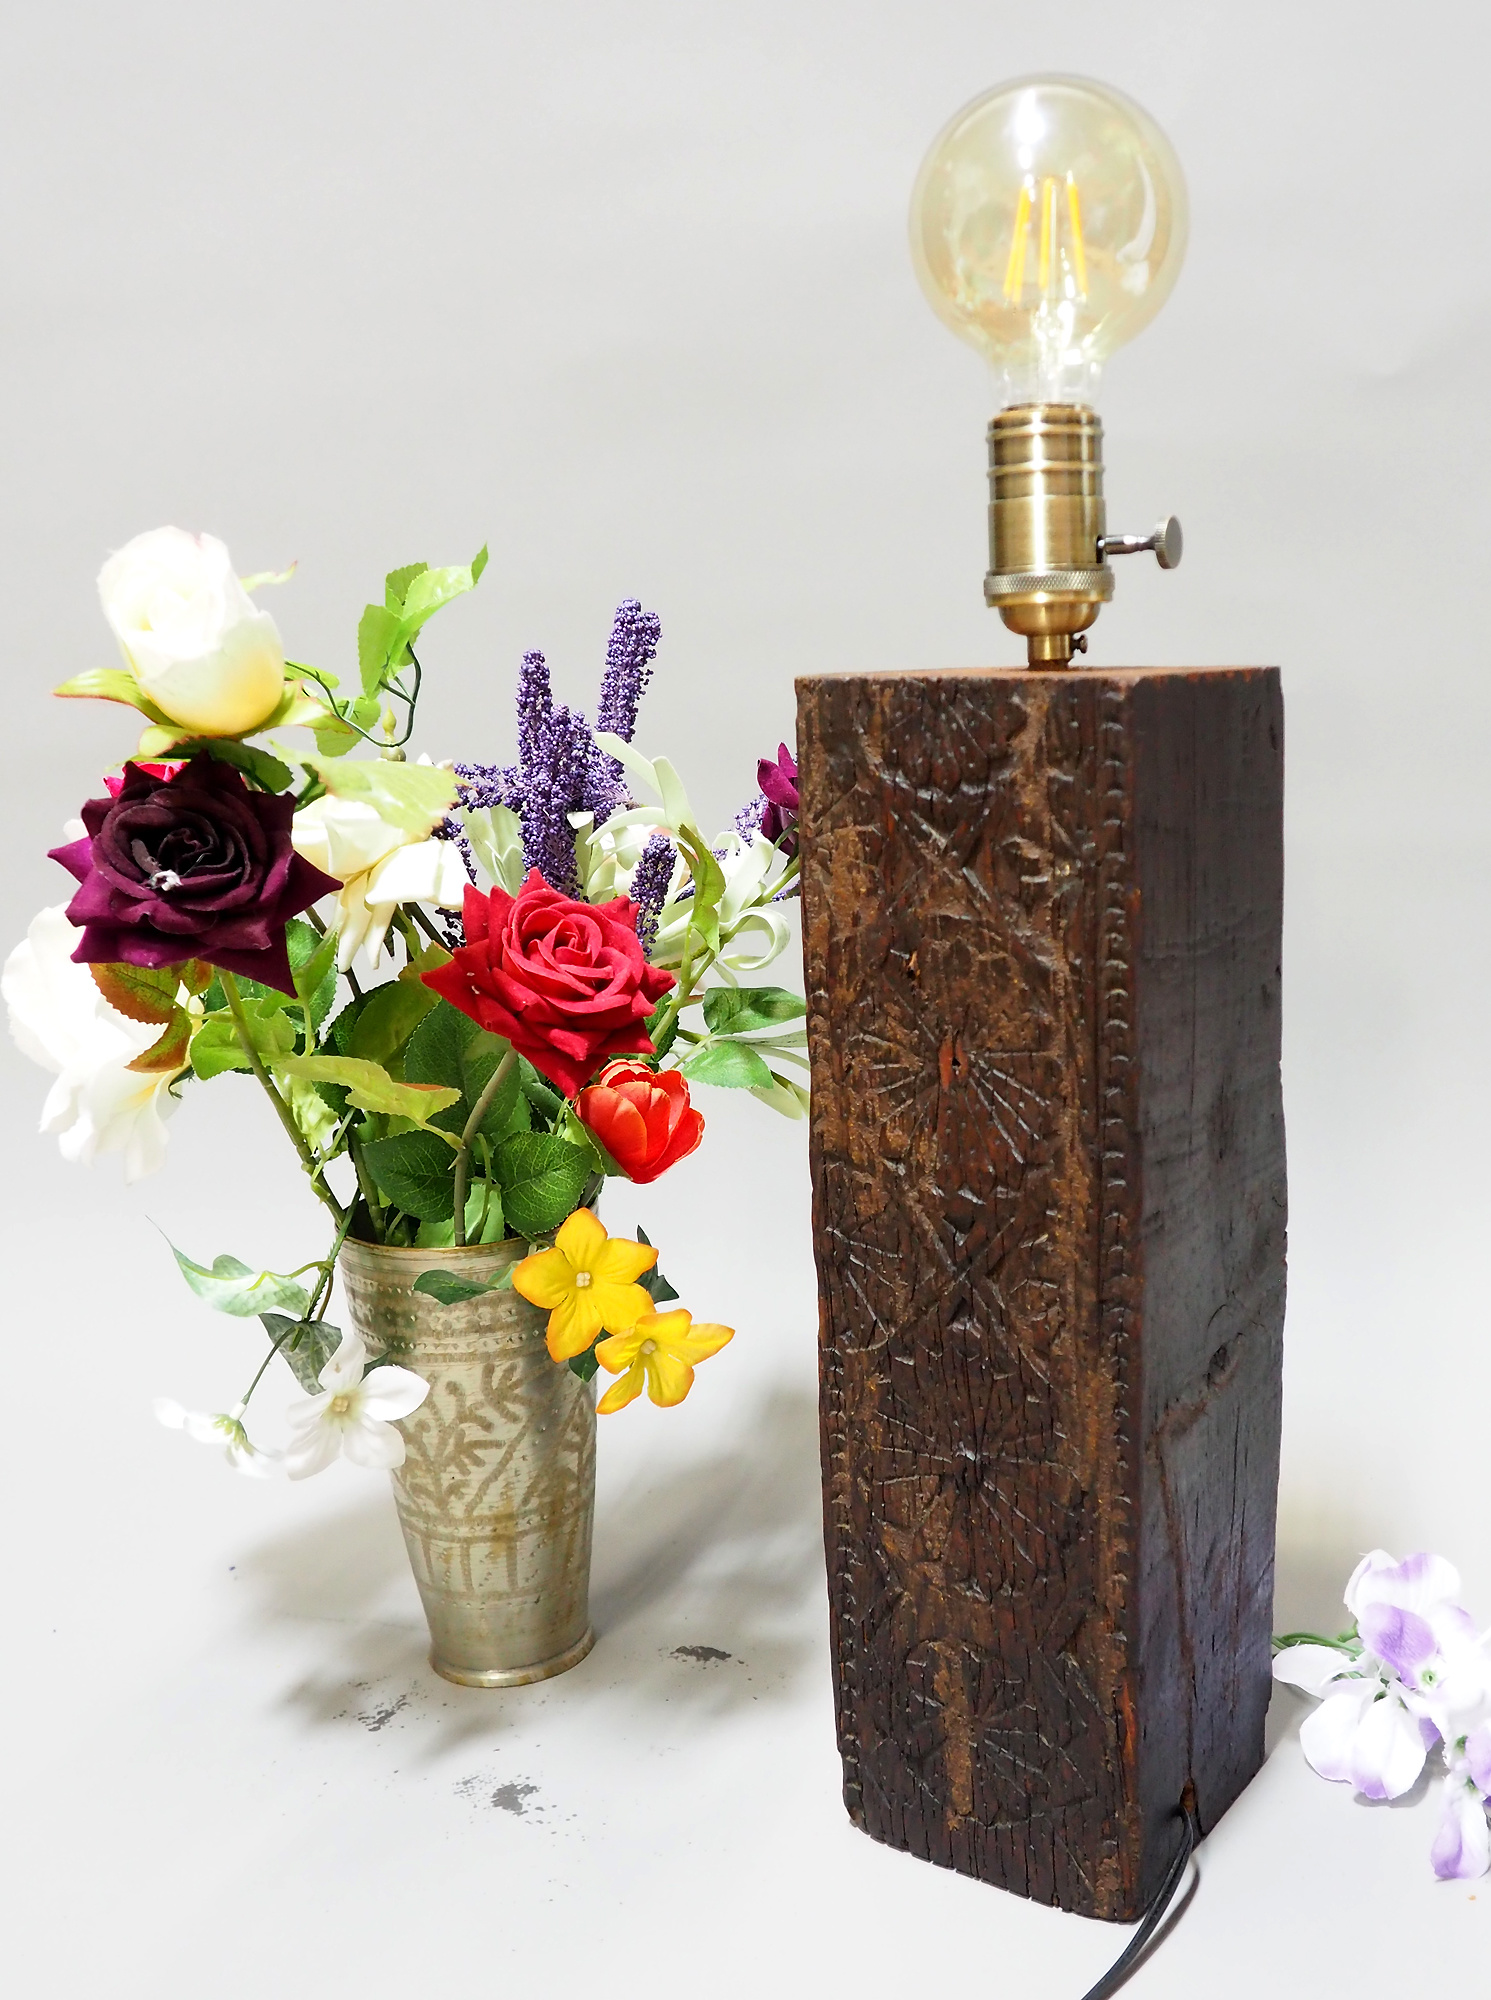 islamische antike orient massiv Holz Lampenfuß Lampensockel aus Nuristan Afghanistan Swat-tall pakistan NU2